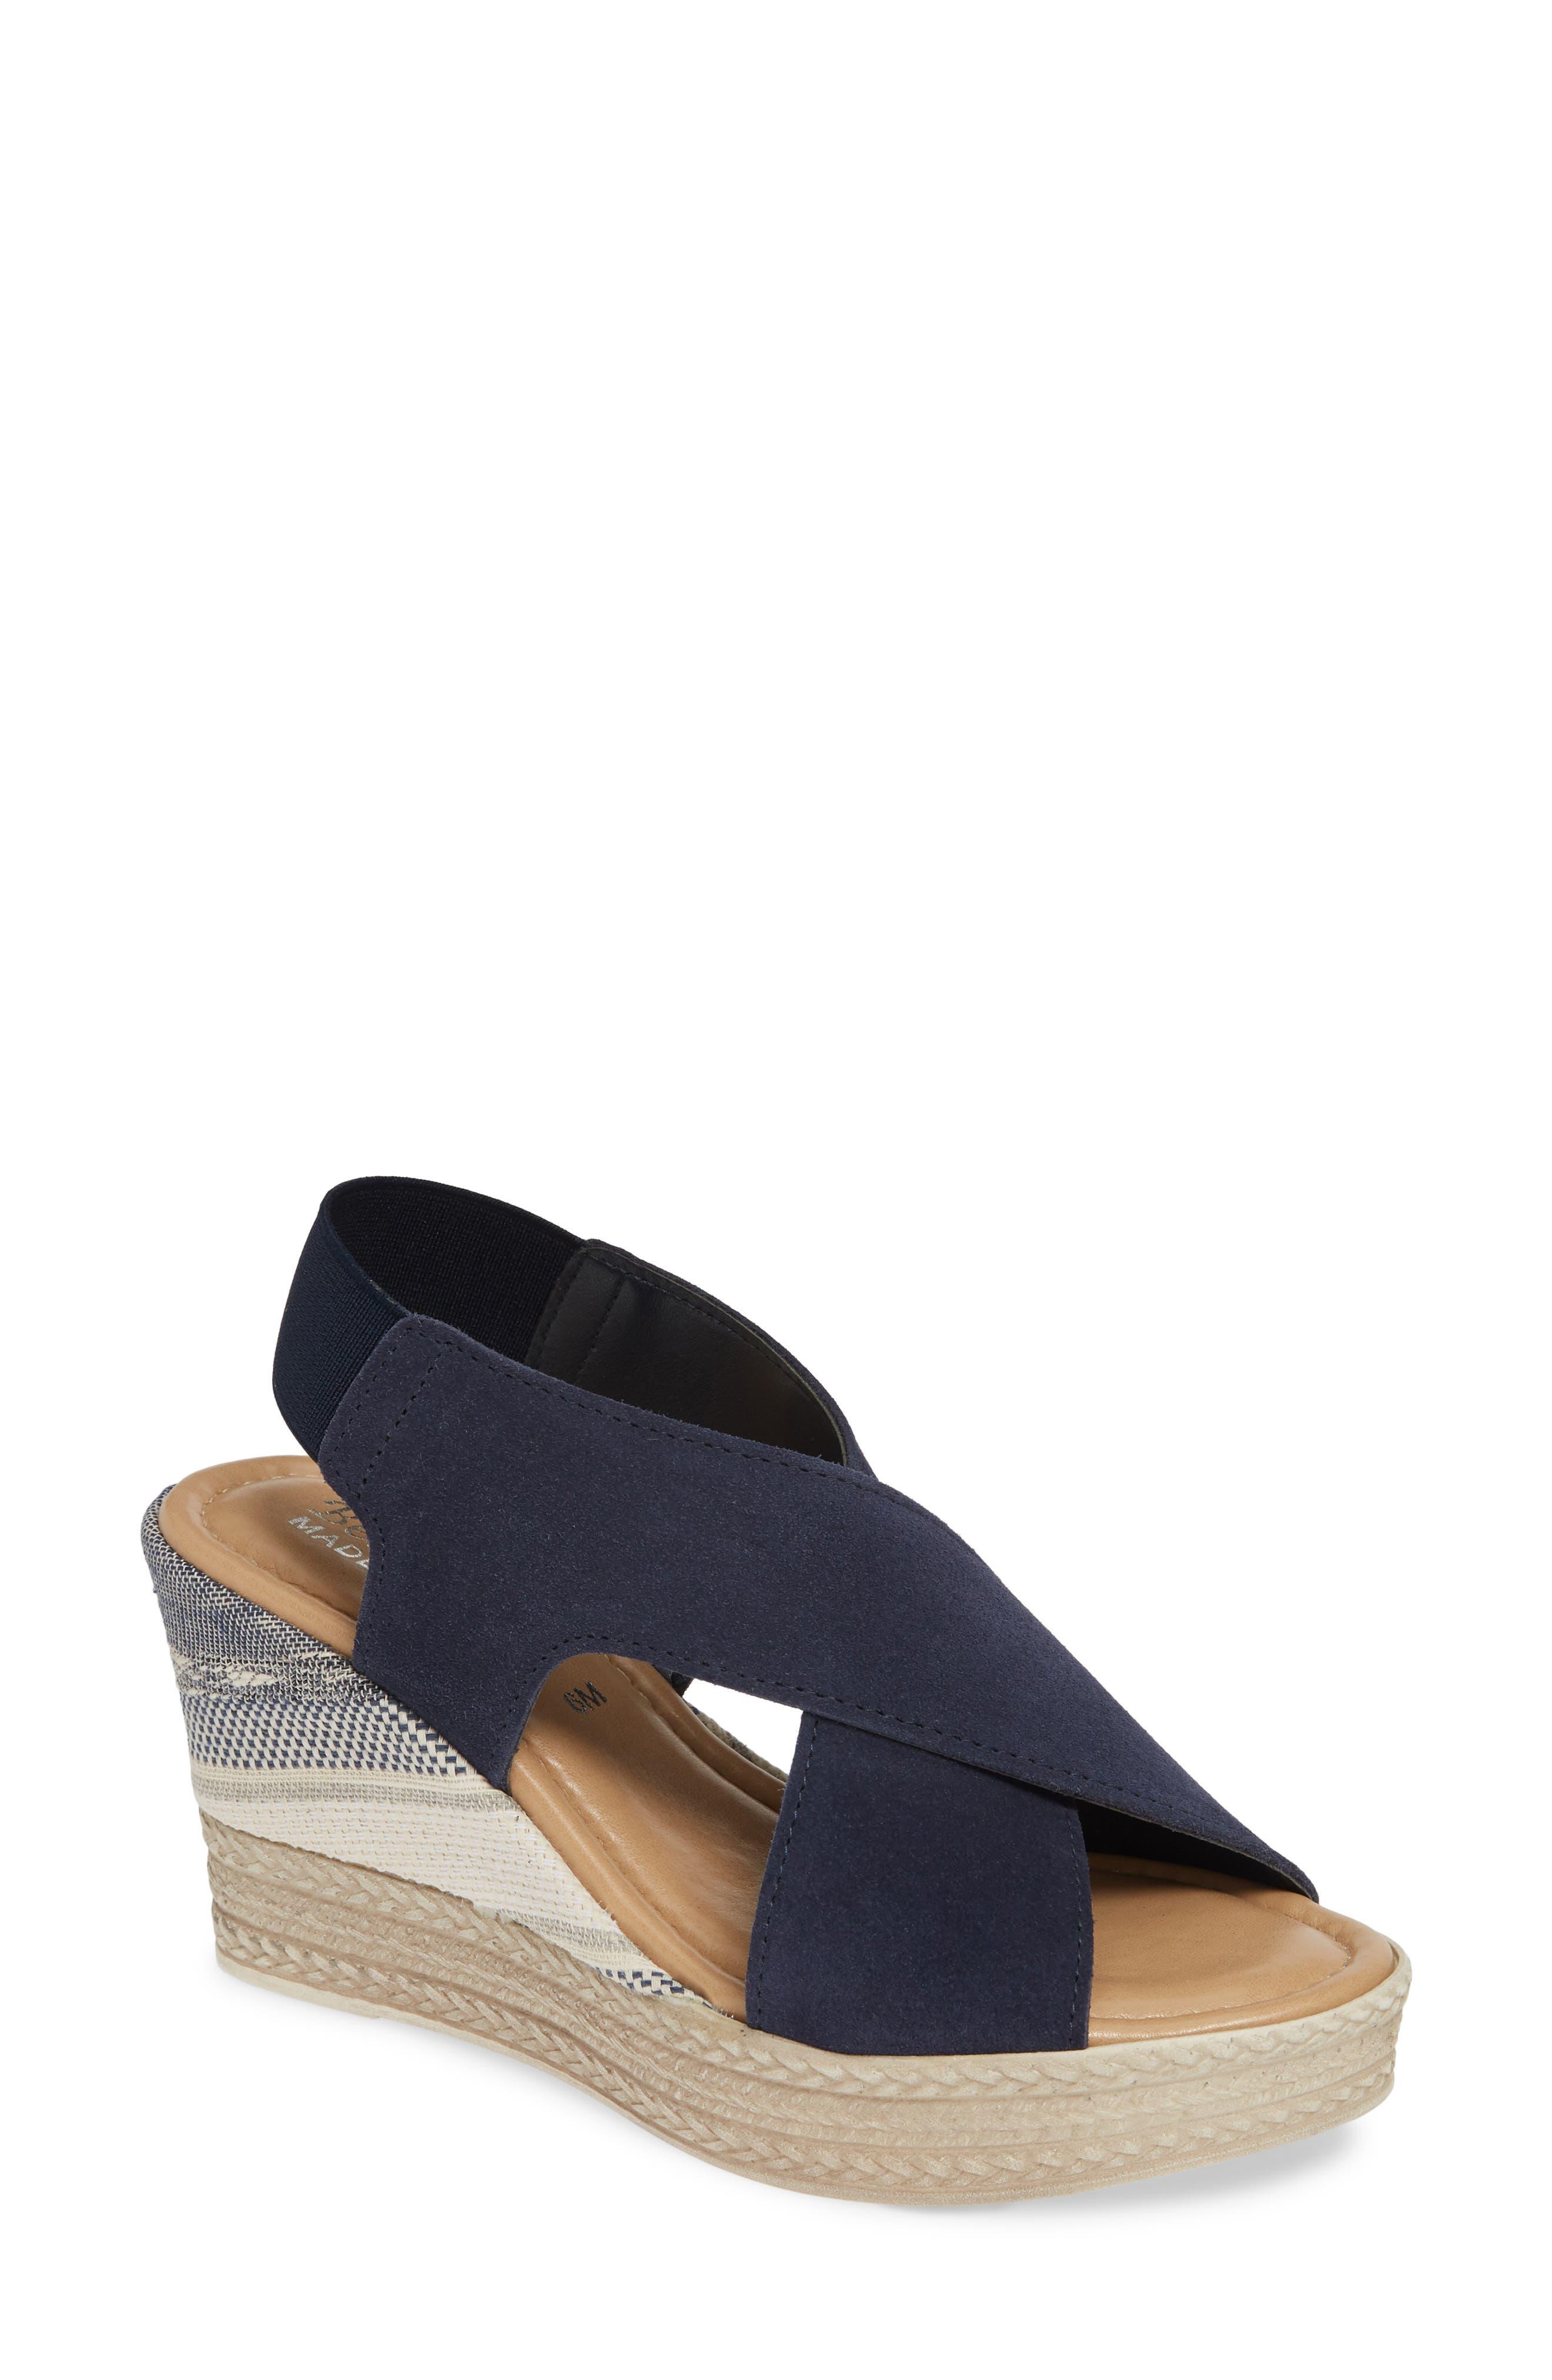 Bella Vita Slingback Sandal, Blue